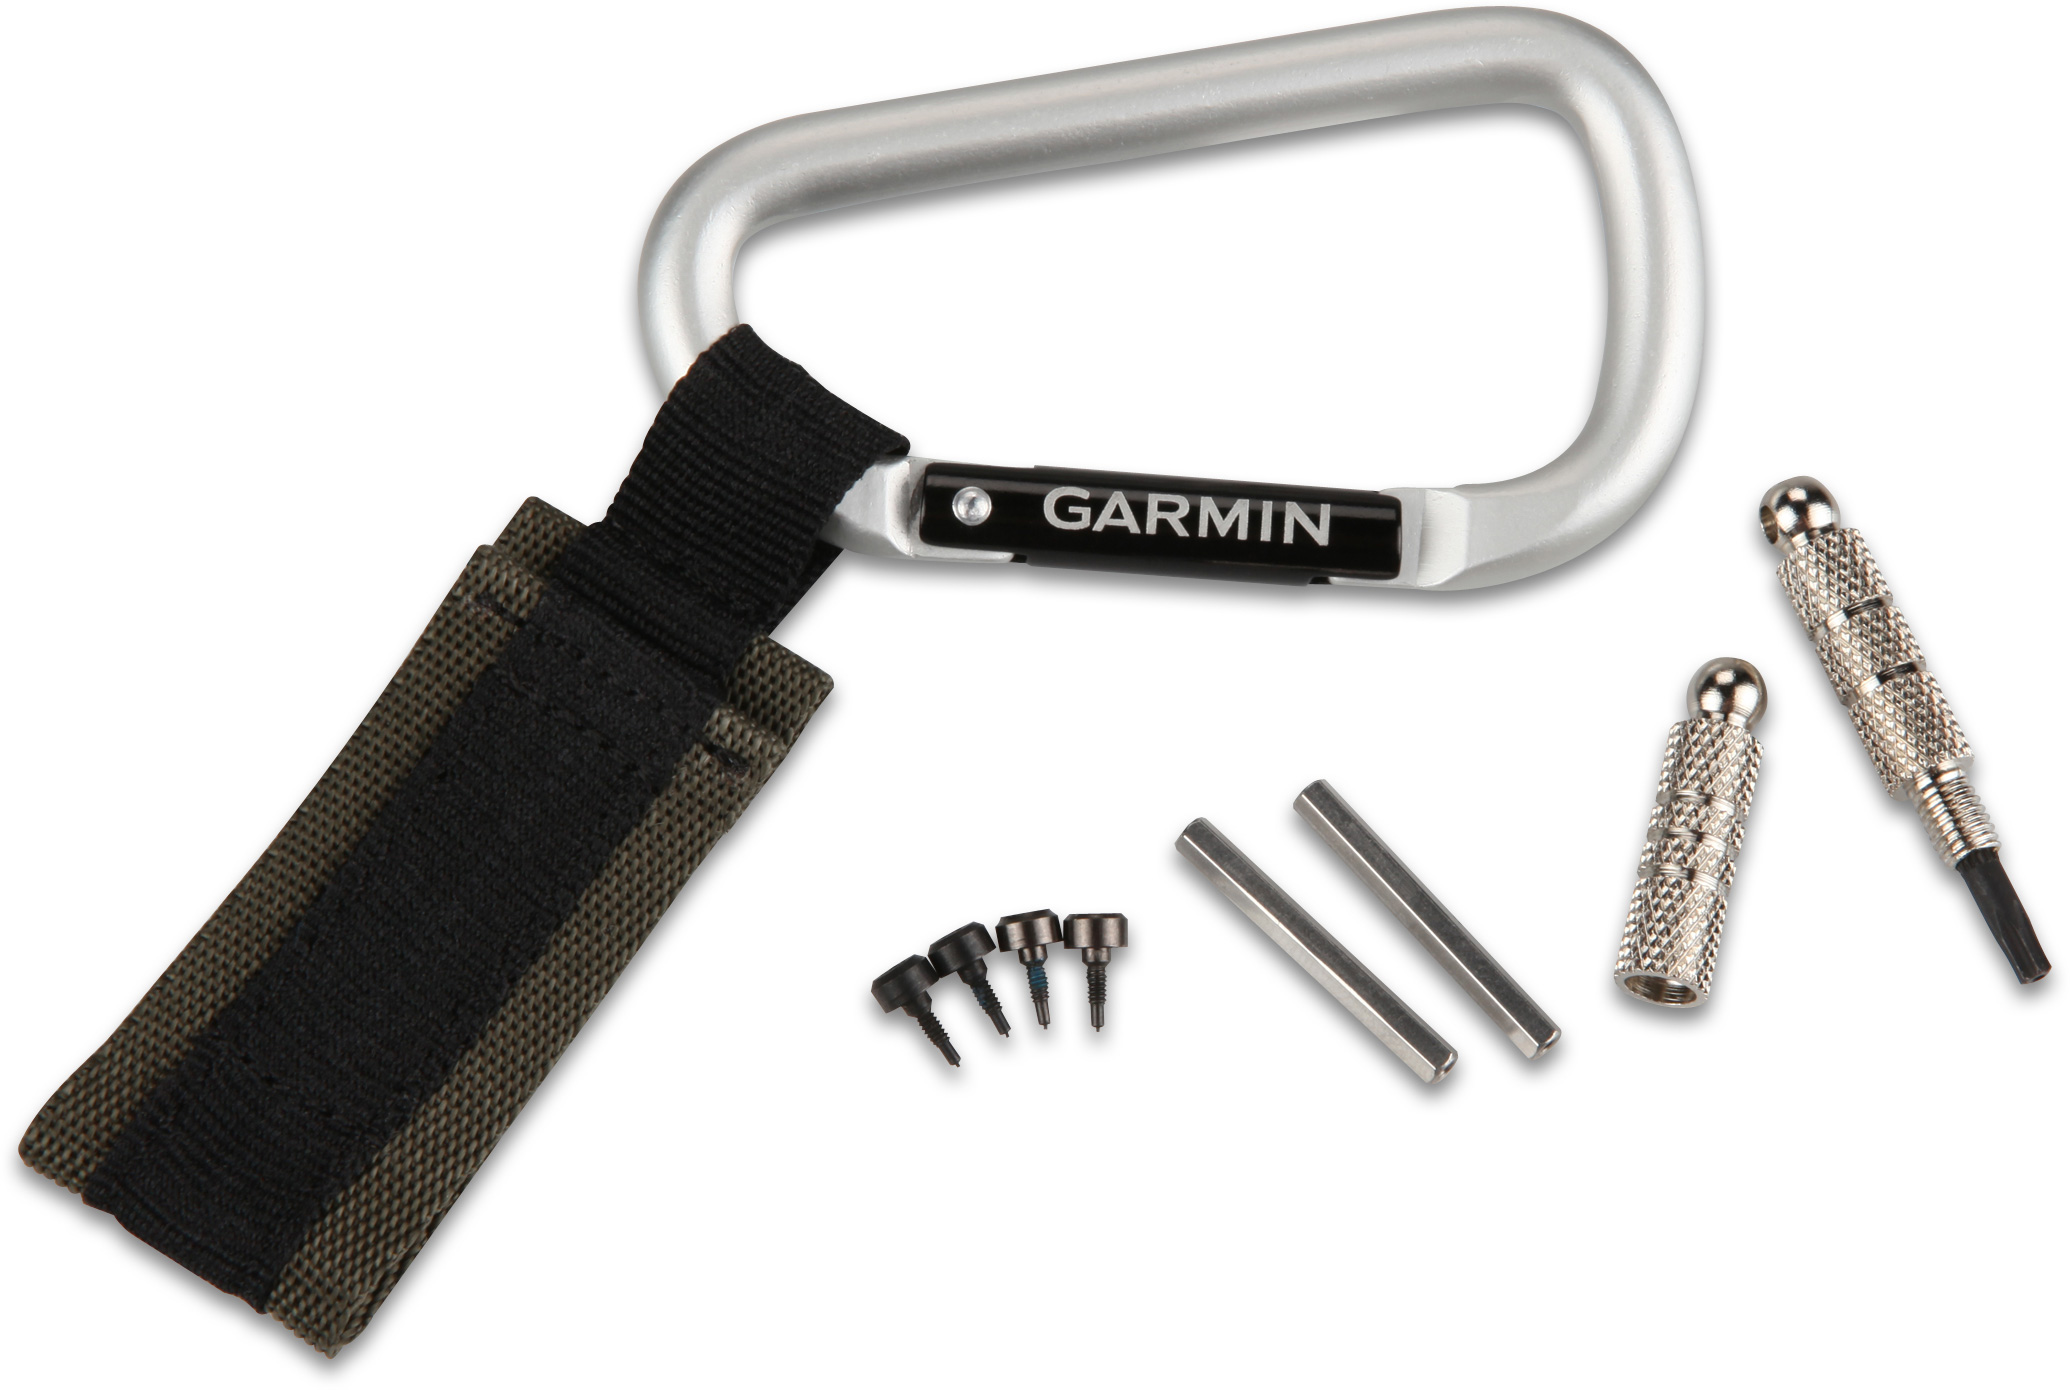 Garmin Carabiner Strap Watch Mount Holder D2 fenix 2 quatix, tactix 010-11814-03